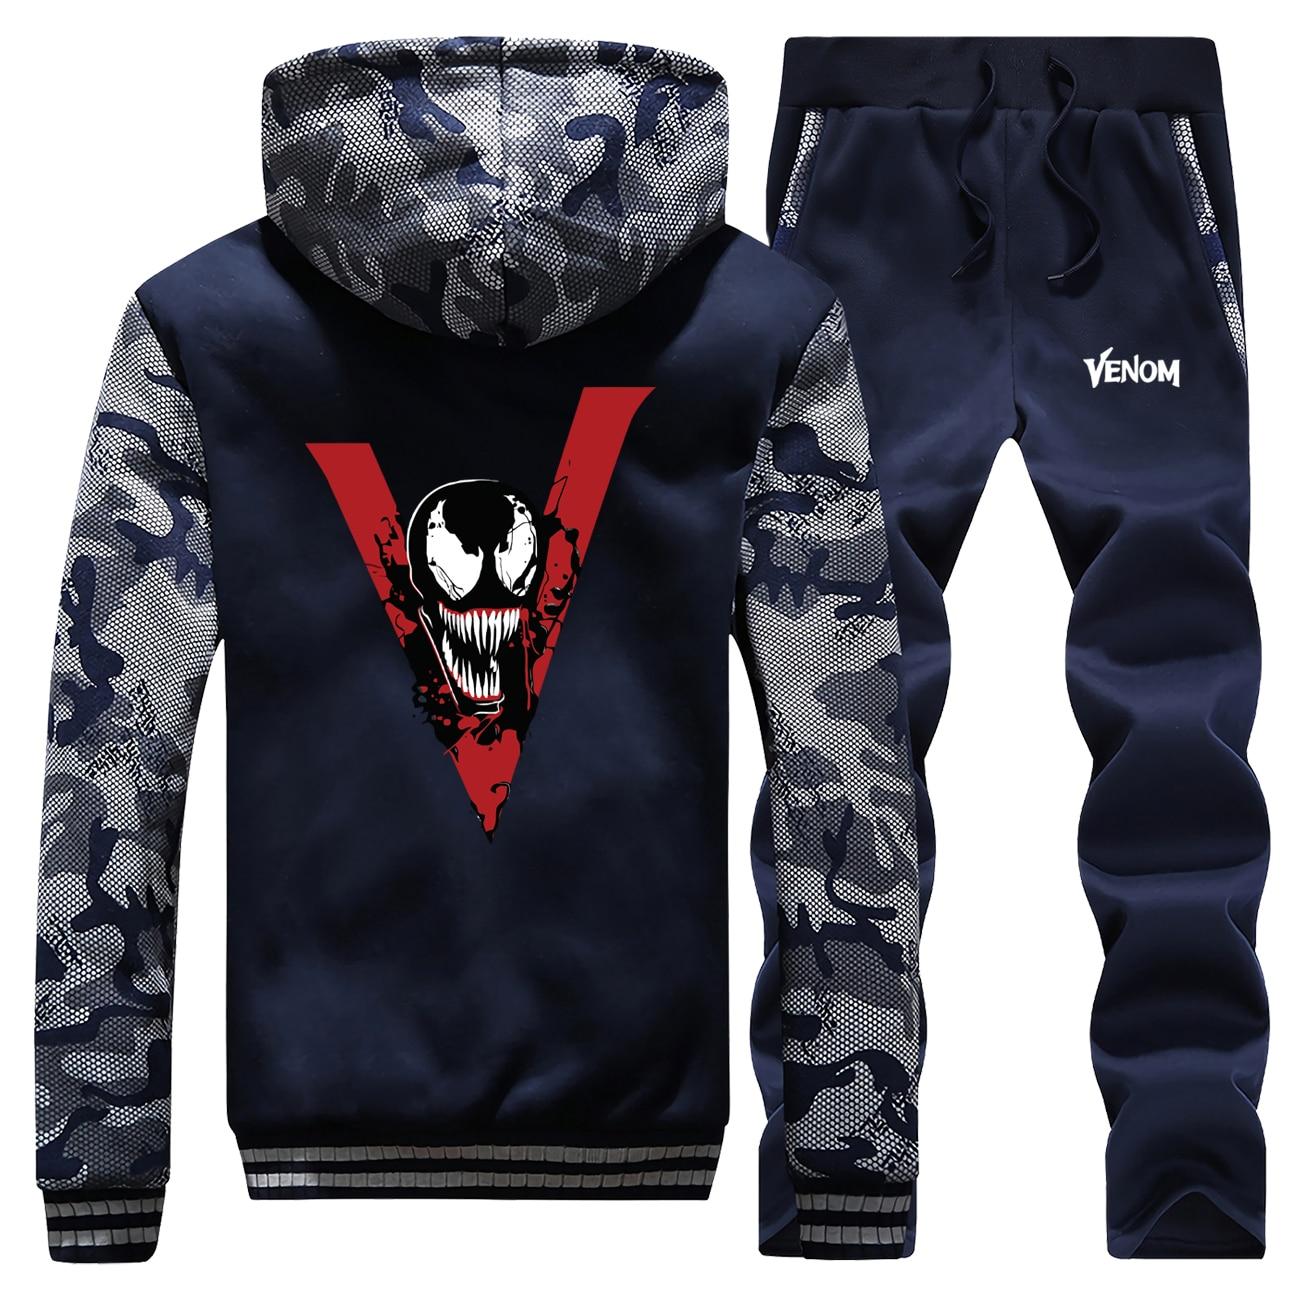 Super Hero Print Camo Jackets Set Venom Men's Sets Eddie Anti Hero Fleece Pants Sweatshirts Casual Winter Sportswear Tracksuit